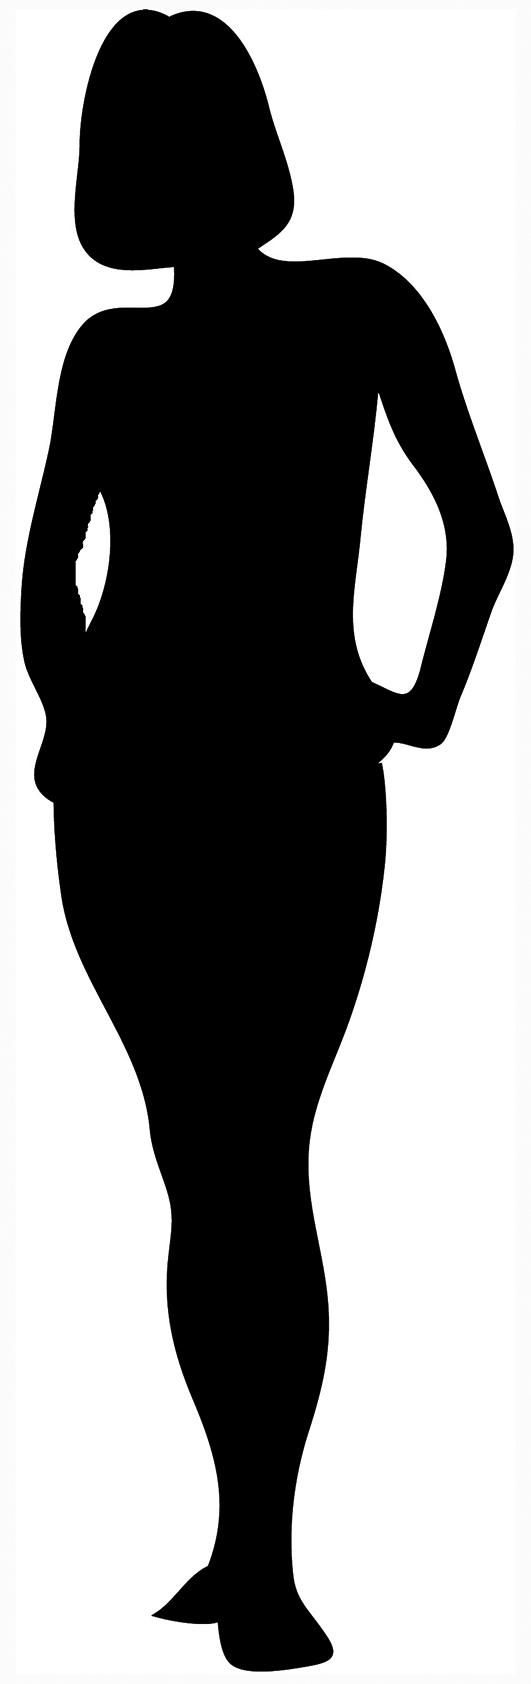 Black Woman Silhouette Clipart.